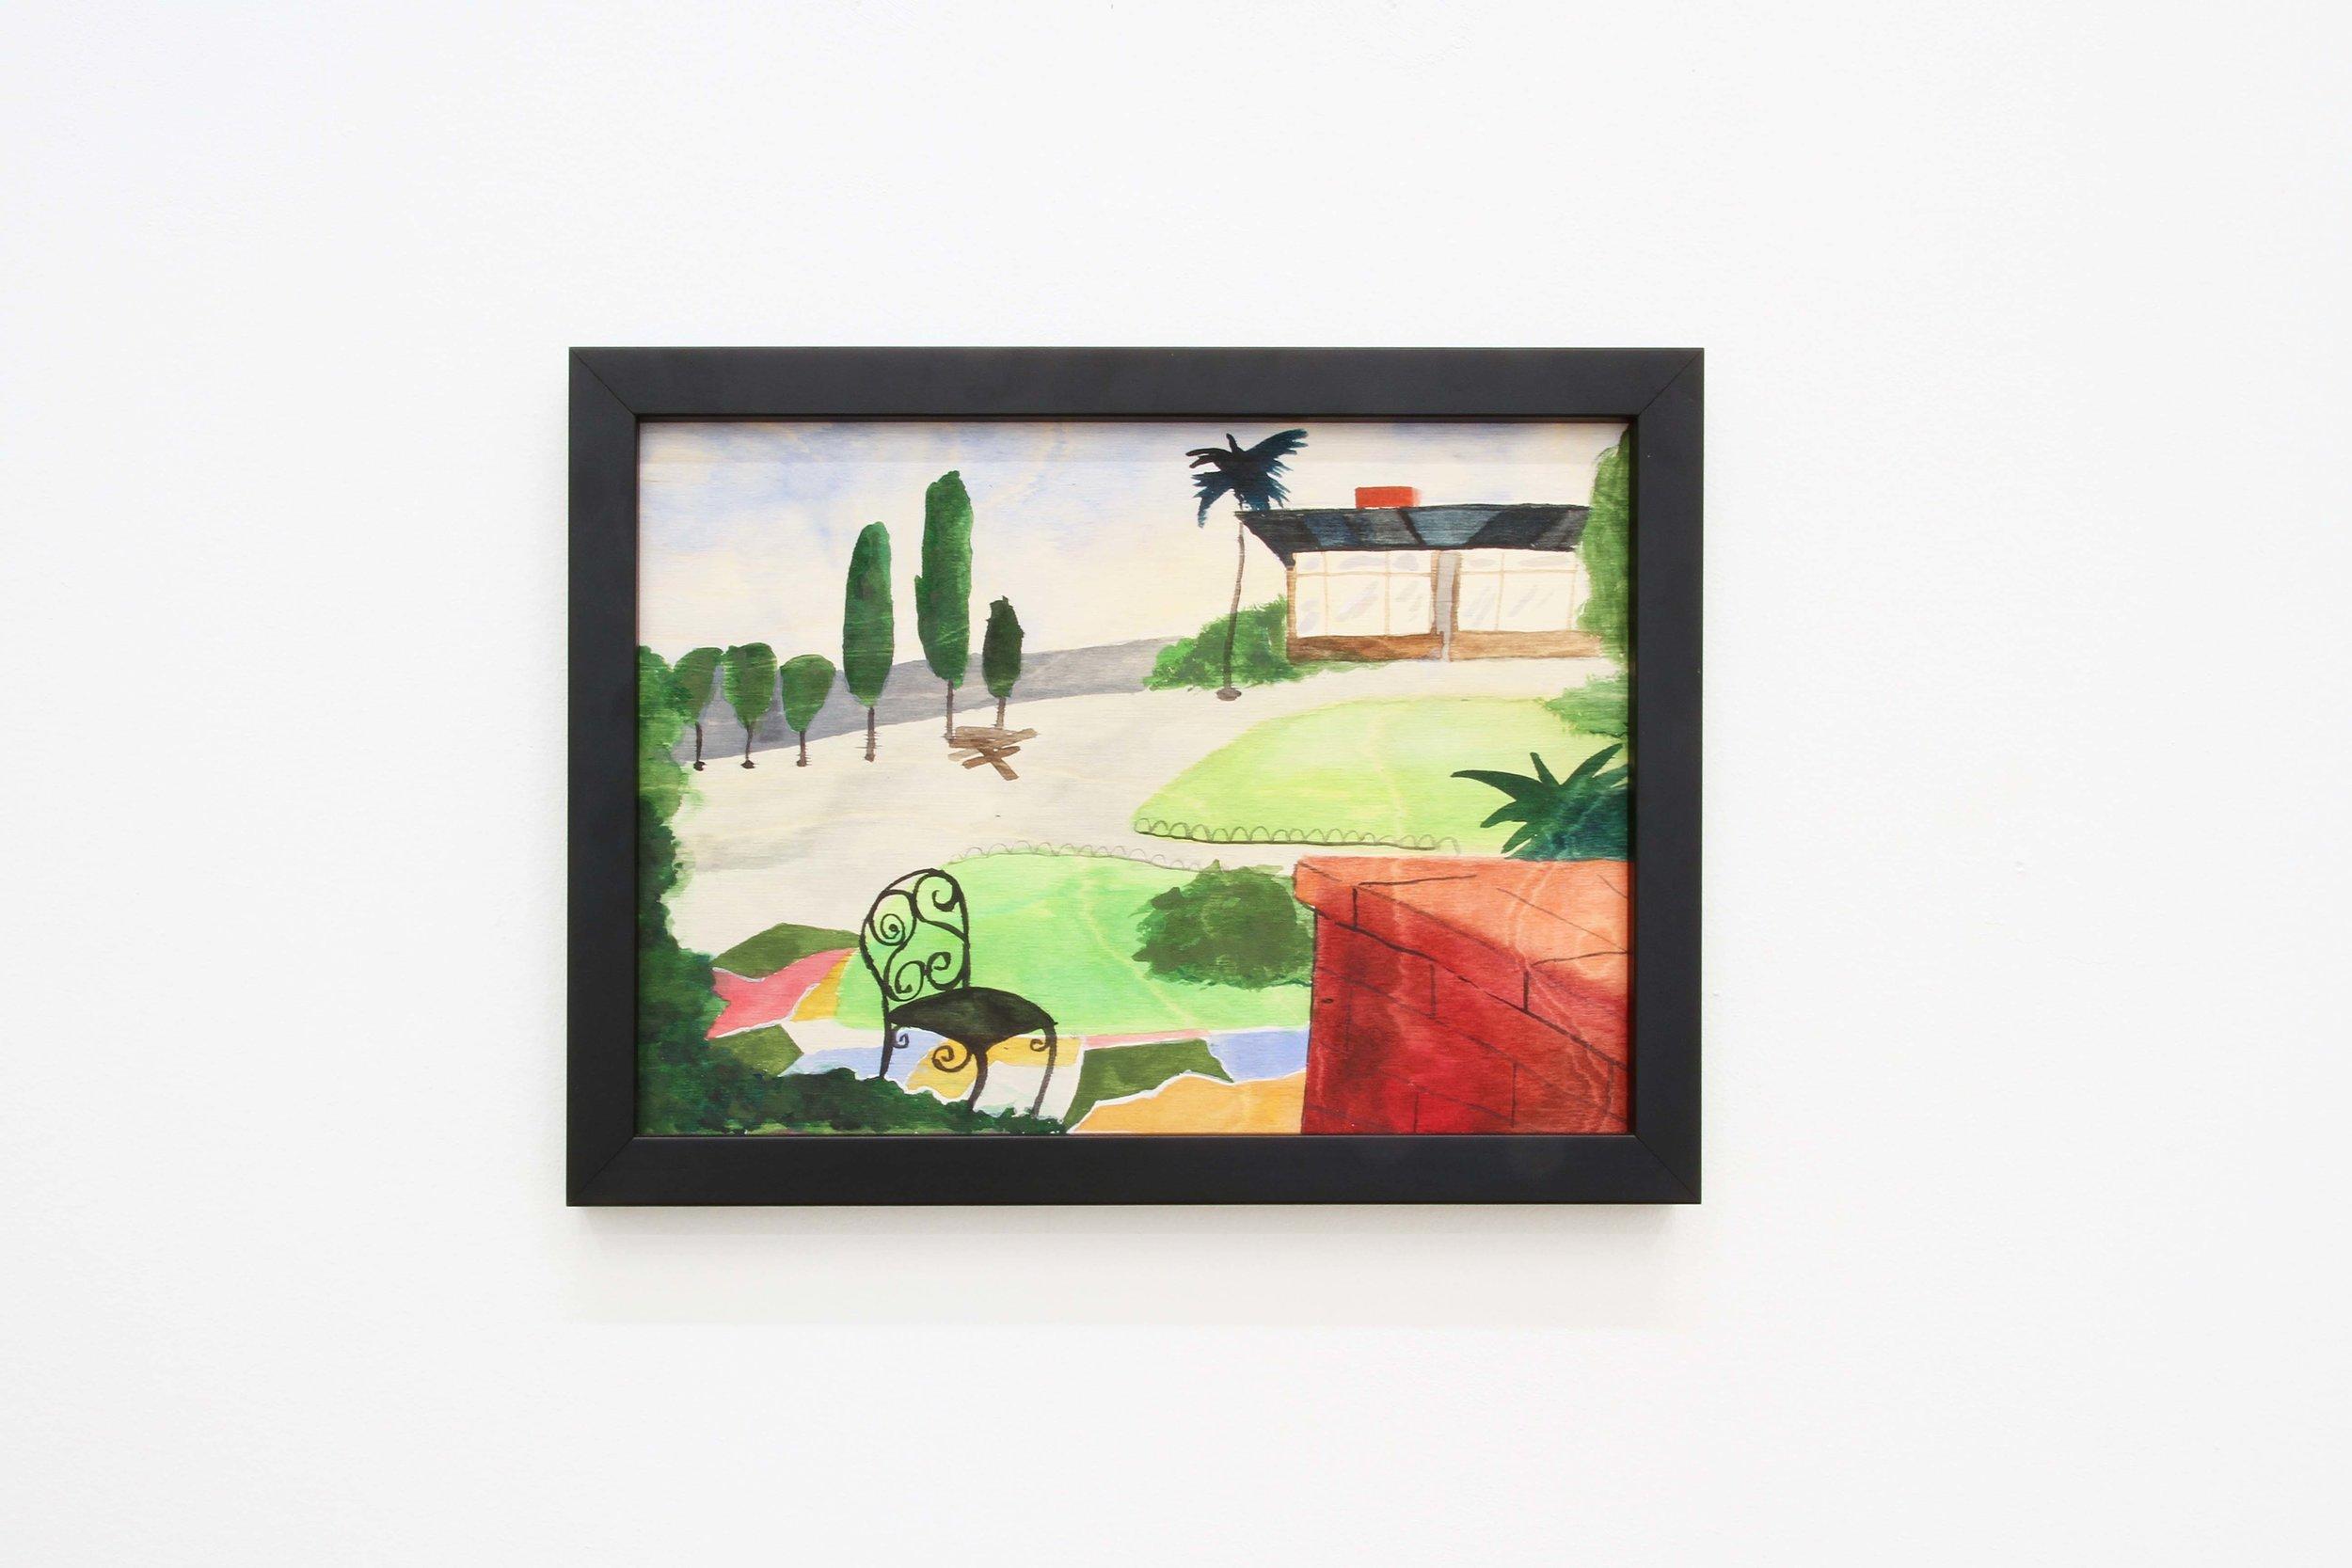 Ohne Titel (Horror), 2018 Gouache on wood 21 x 29.7 cm